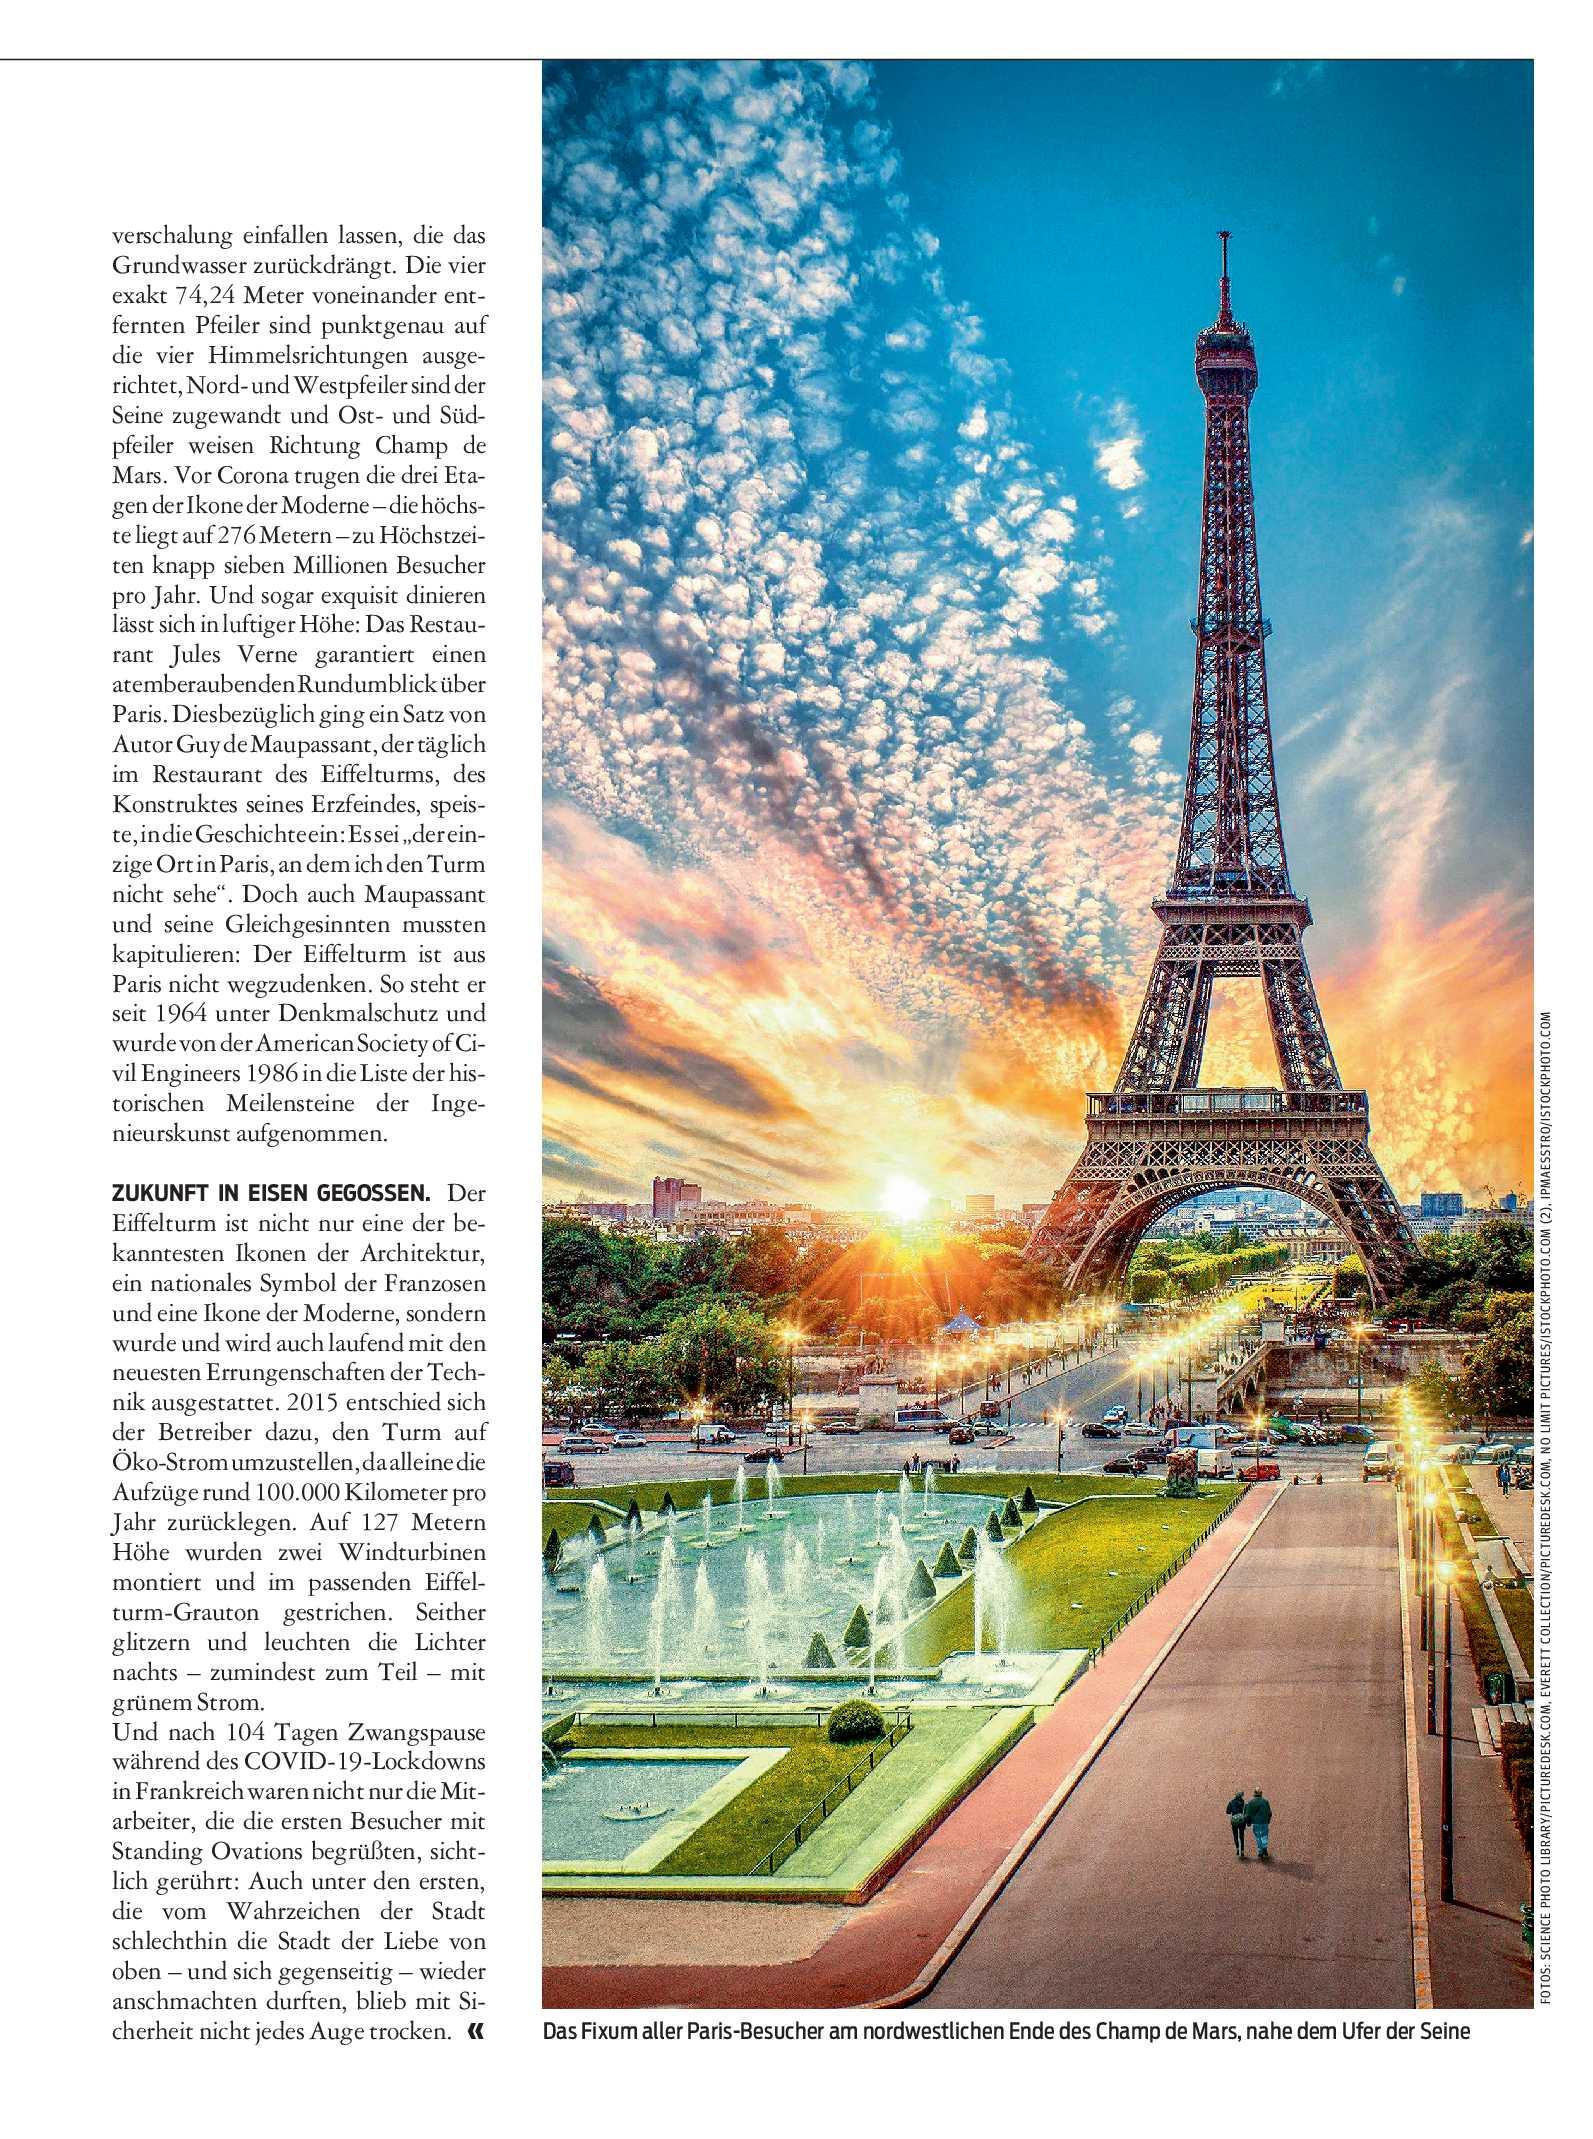 public/epaper/imported/20200930/kurier/magazin/magazin_20200930_057.jpg